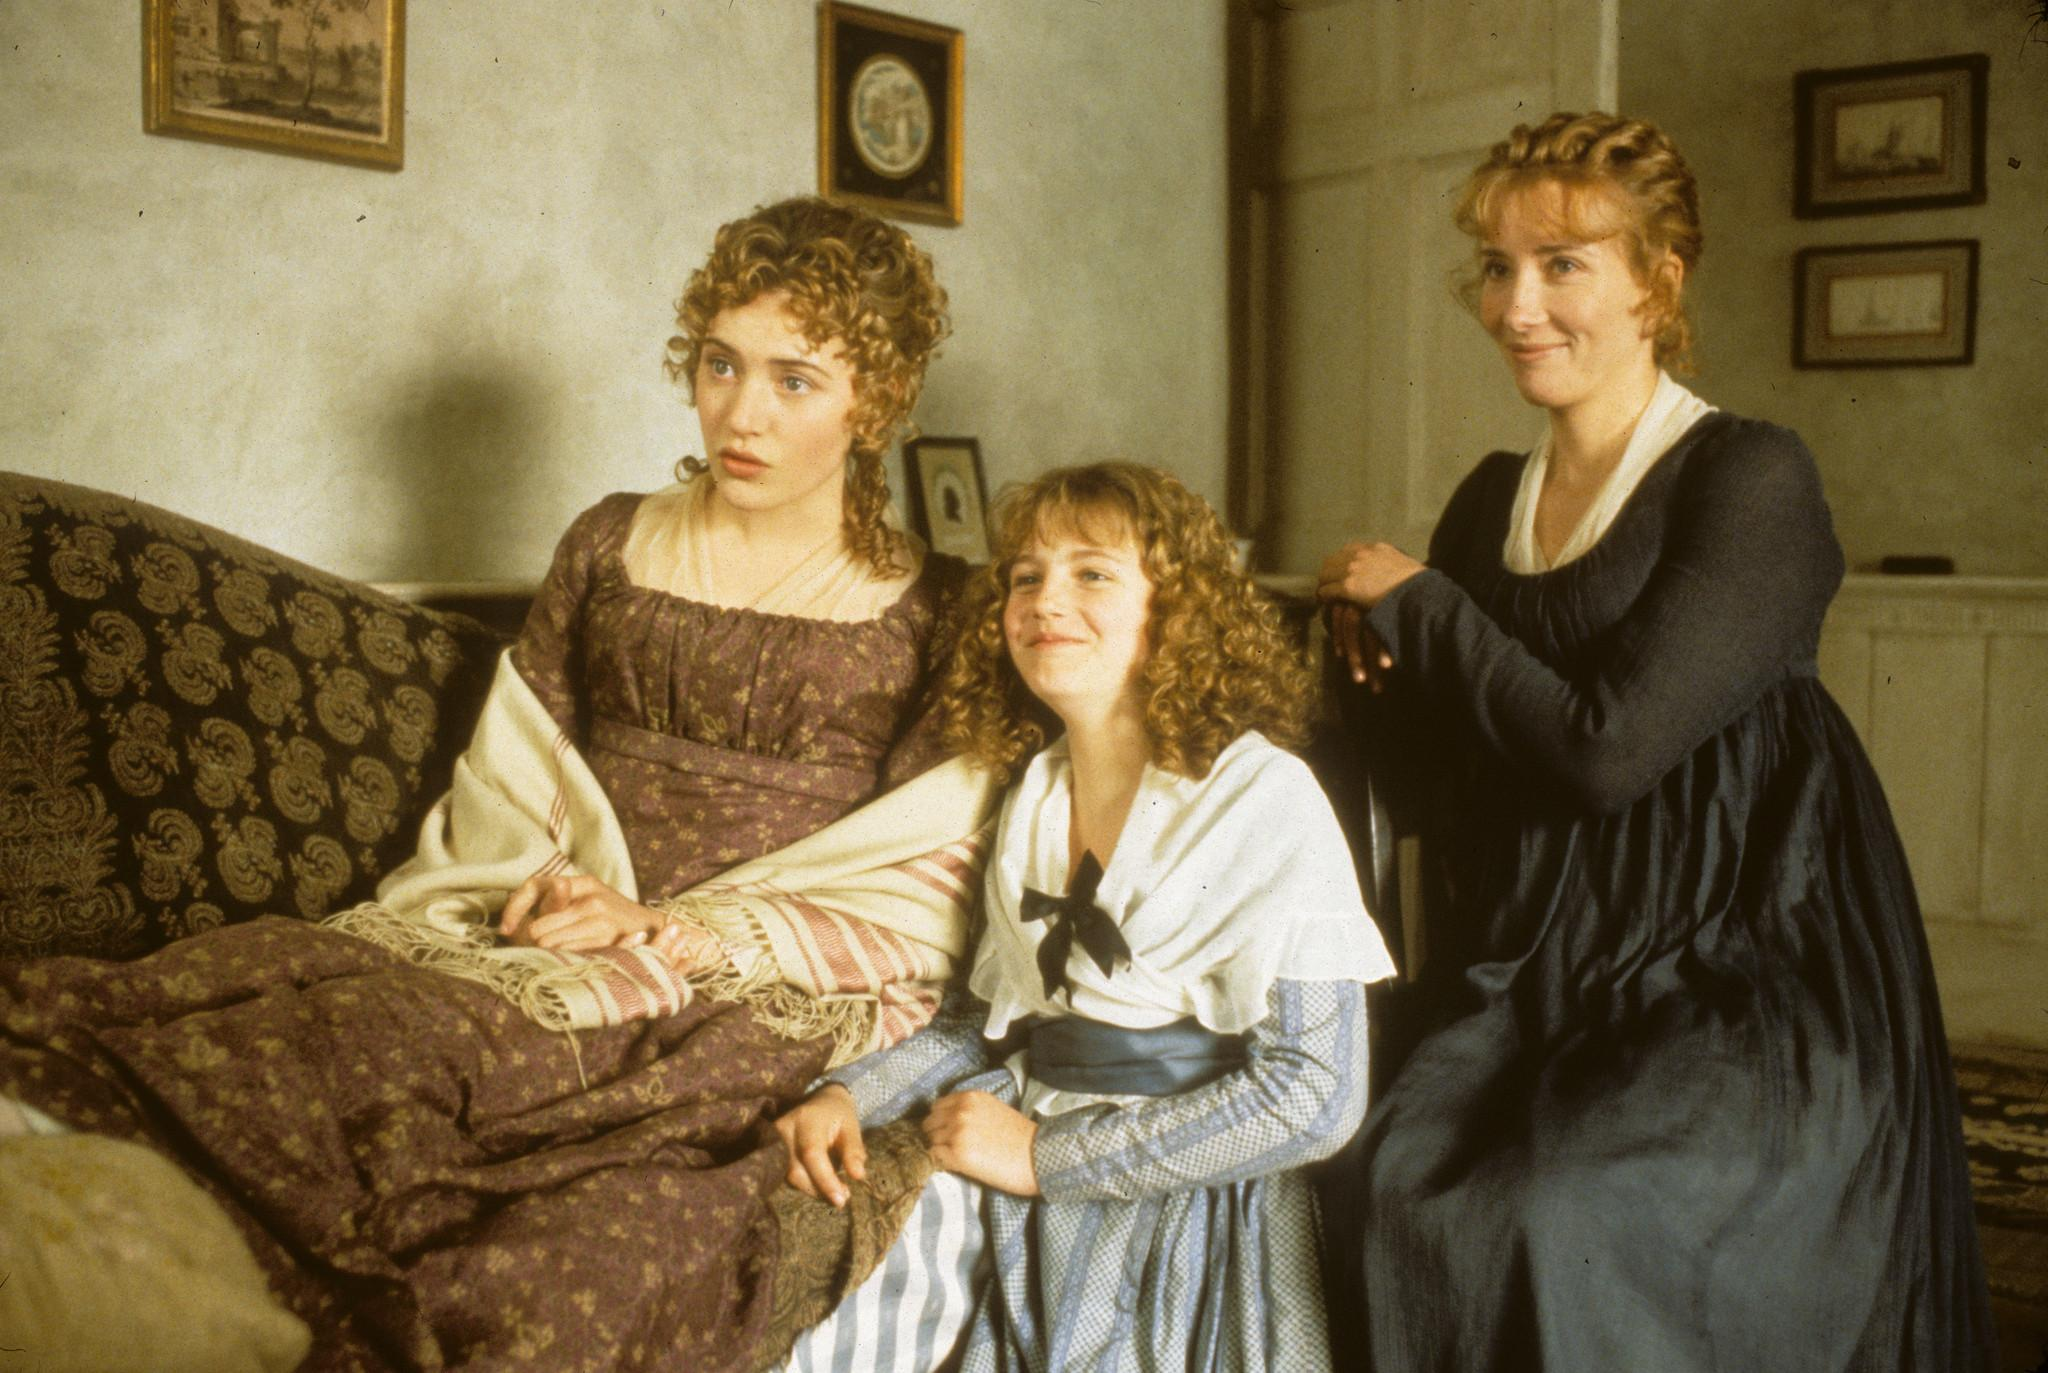 Marianne, Margaret, and Elinor Dashwood